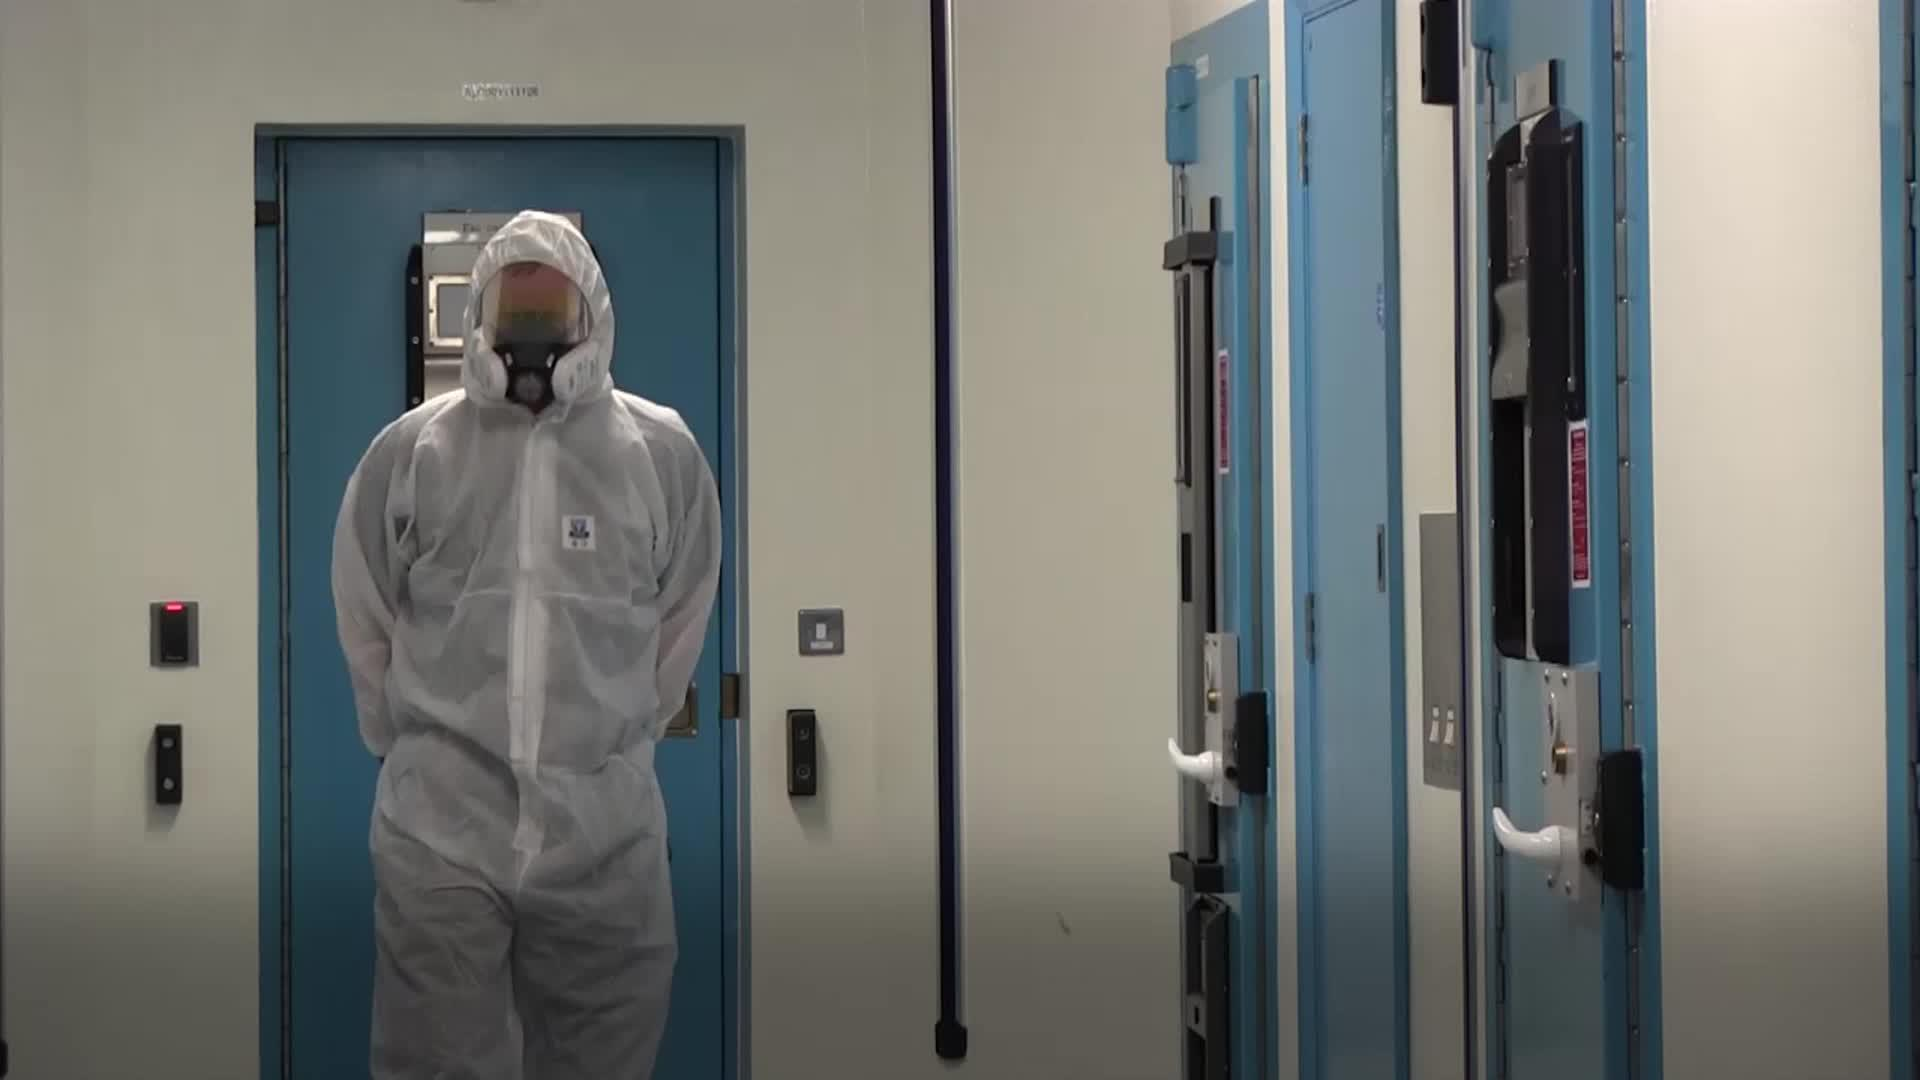 Belfast custody unit makes secure block for Covid-19 prisoners